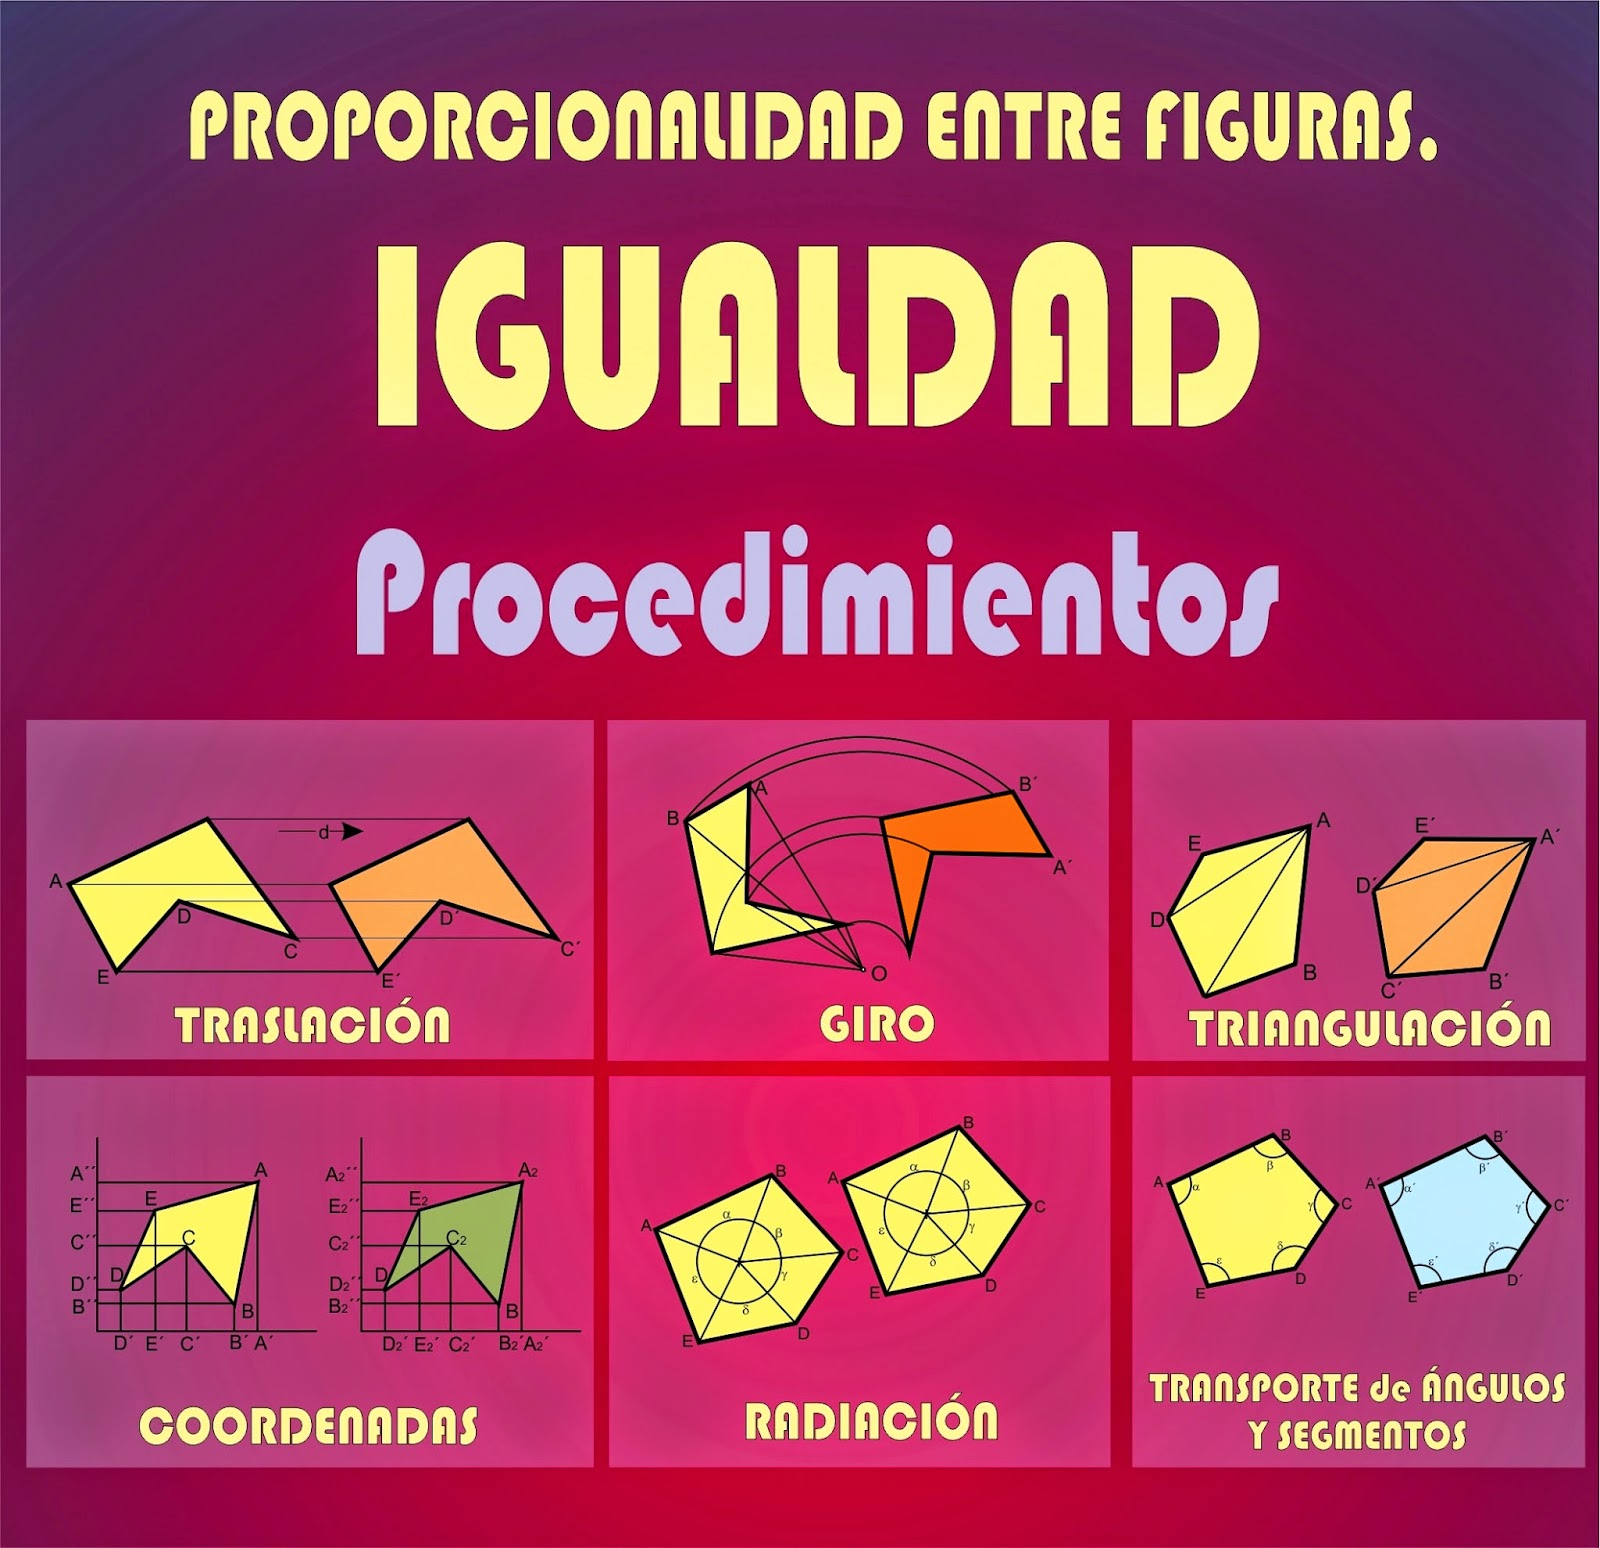 Lecc 11 furthermore Hilorama moreover Divertidas Almohadas Con Forma De Figuras Geometricas besides moldes Berto in addition La Personificacion. on figuras para hacer